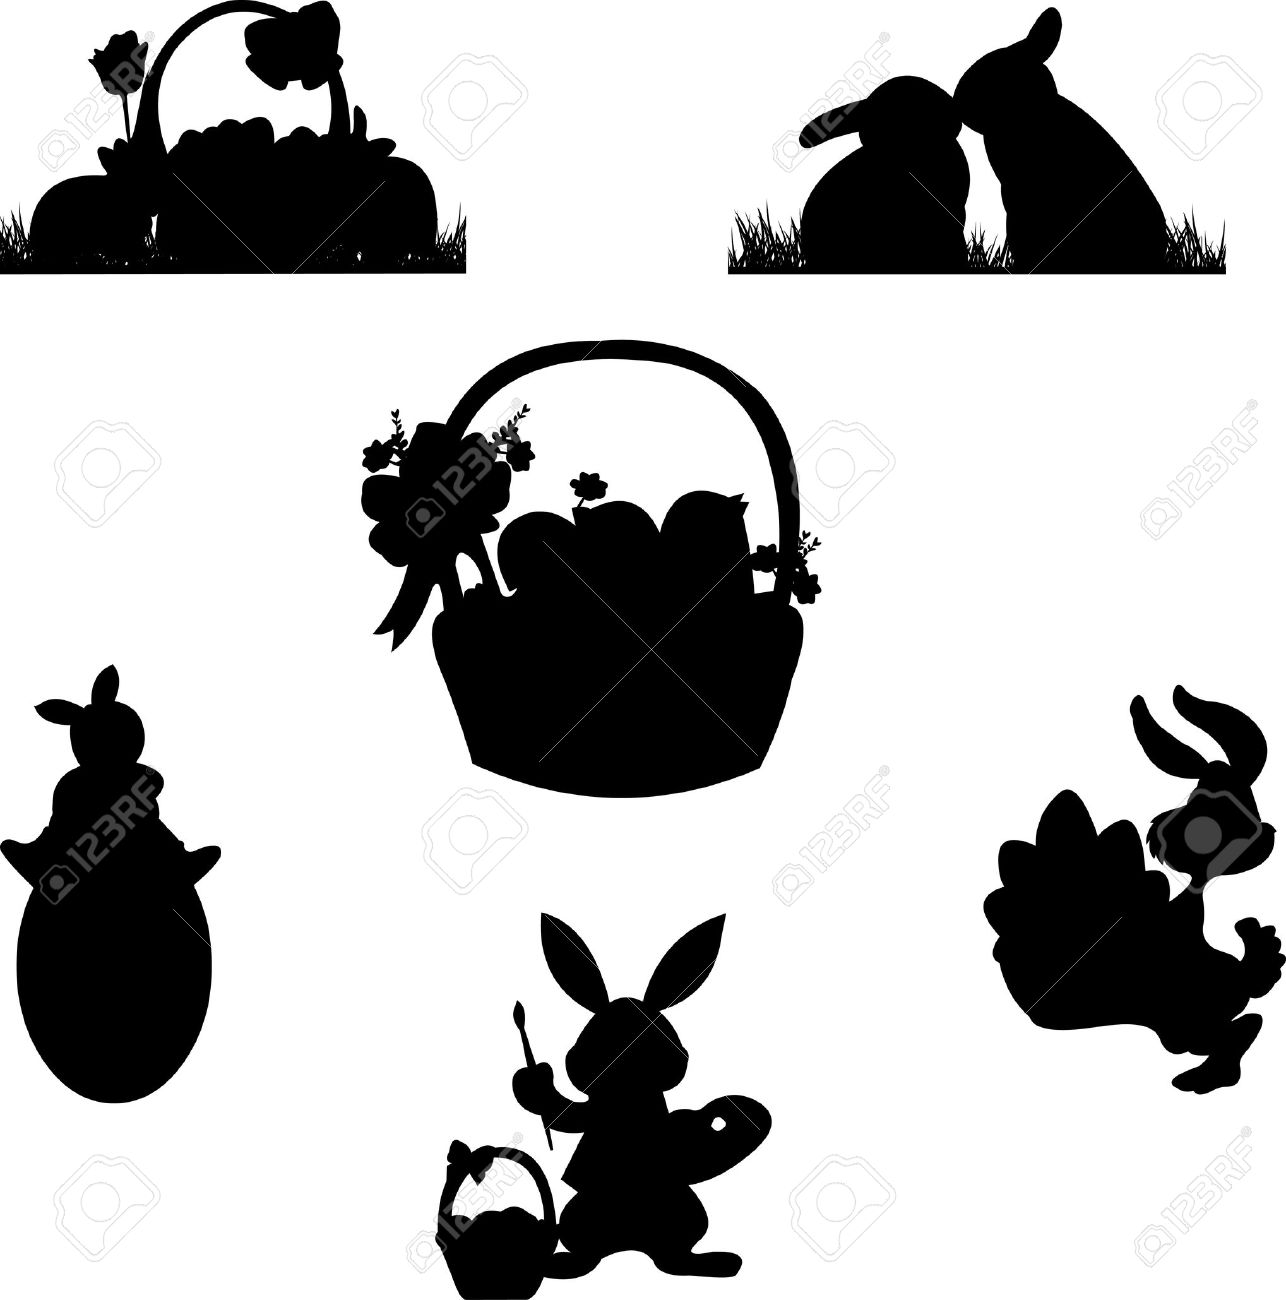 Easter basket silhouette clipart clip art freeuse Easter basket silhouette clipart - ClipartFest clip art freeuse